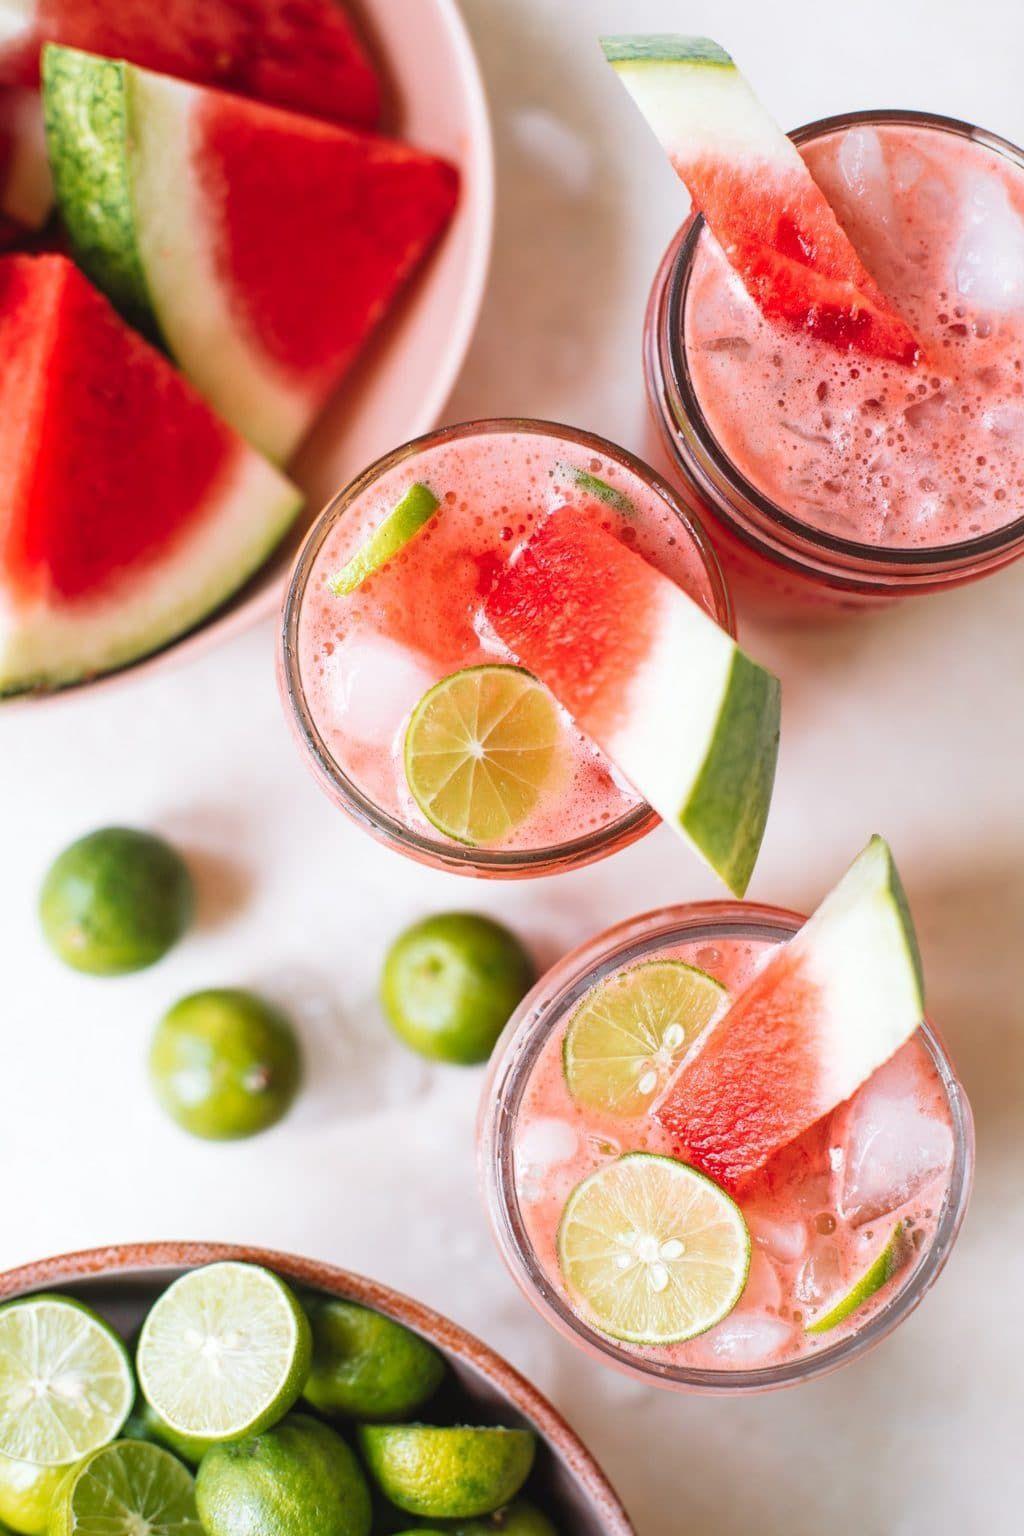 Watermelon Vodka Drink College Housewife Recipe In 2021 Watermelon Vodka Drinks Watermelon Vodka Vodka Drinks